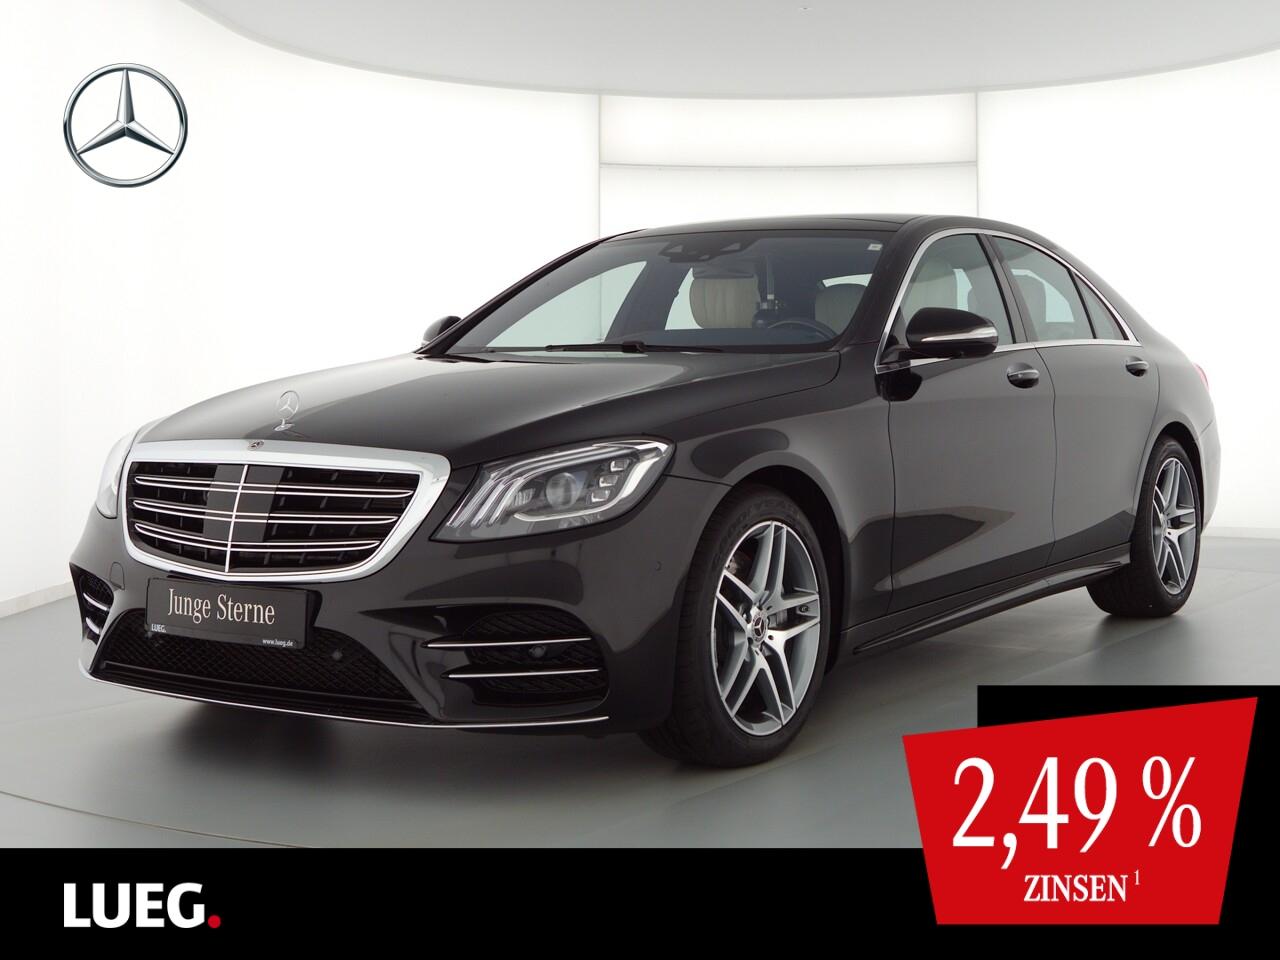 Mercedes-Benz S 350 d 4M AMG+COM+Pano+Burm+Mbeam+KeyGo+HUD+360, Jahr 2020, Diesel